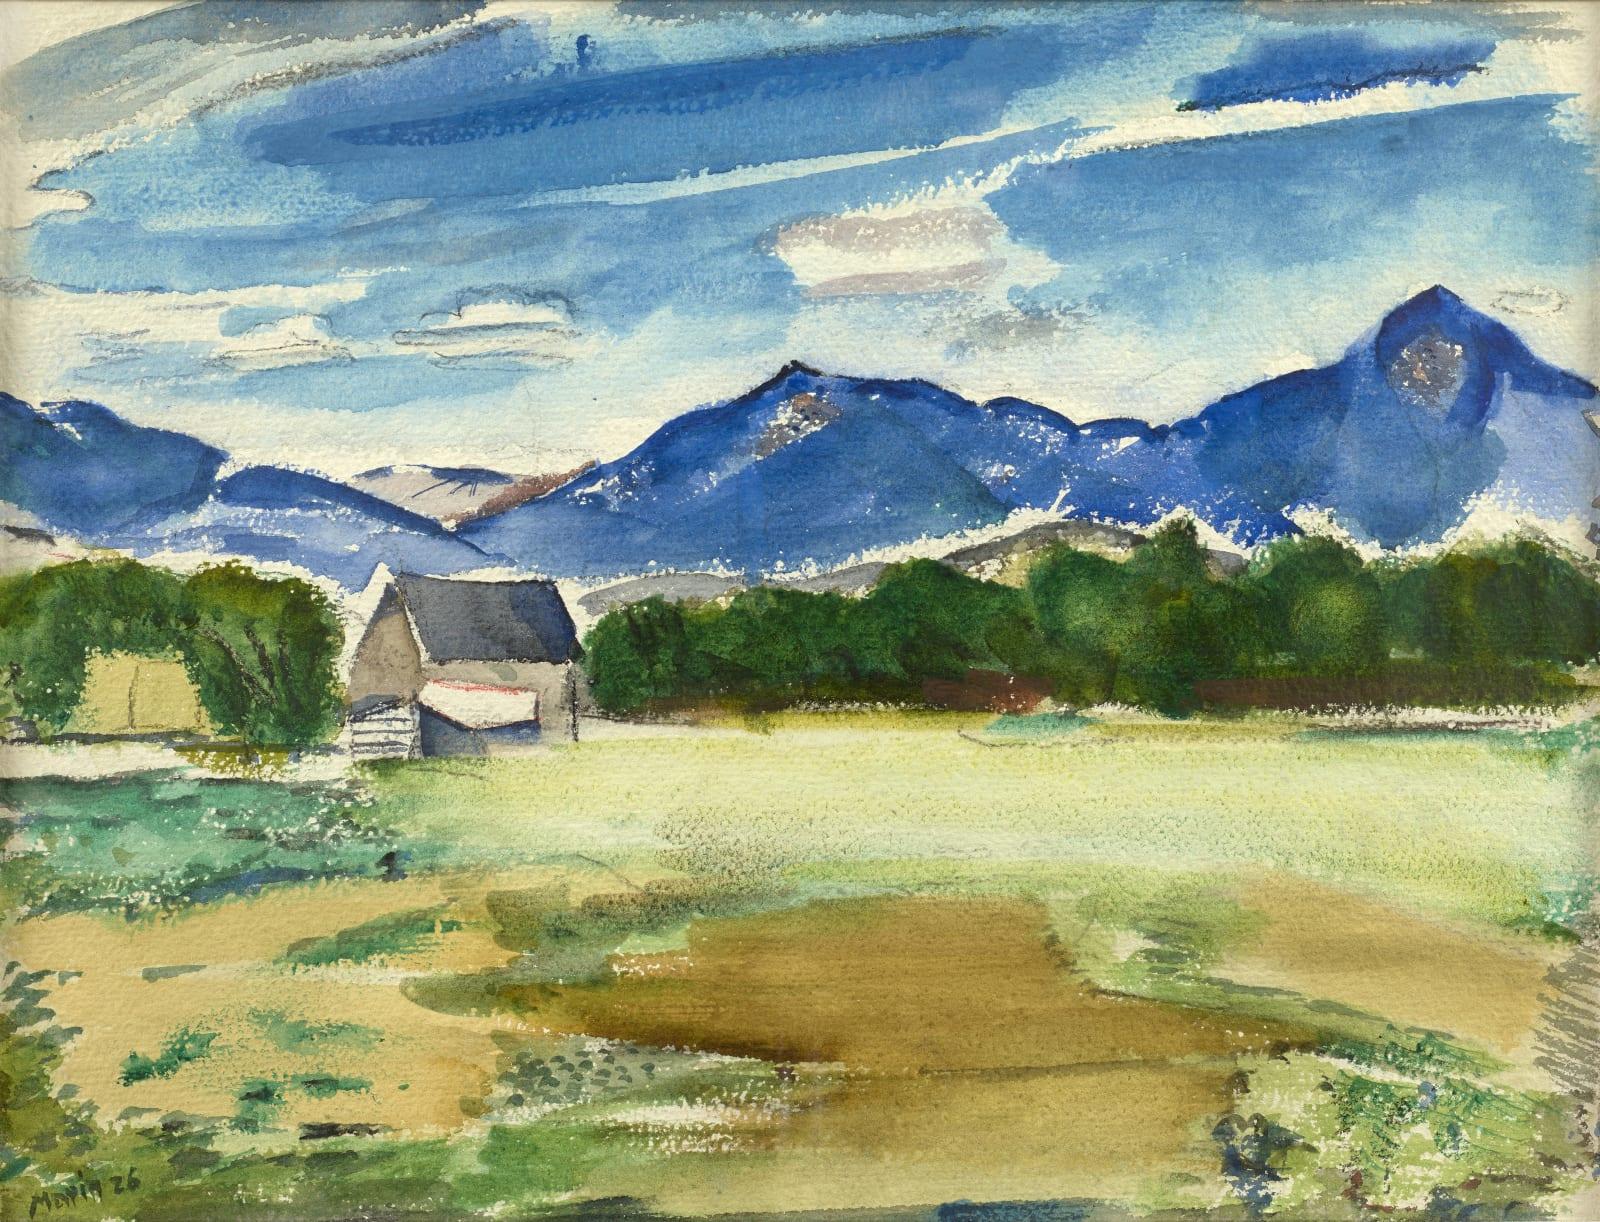 John Marin, Mt. Chocorua and a-Couple-a-Neighbors, 1926